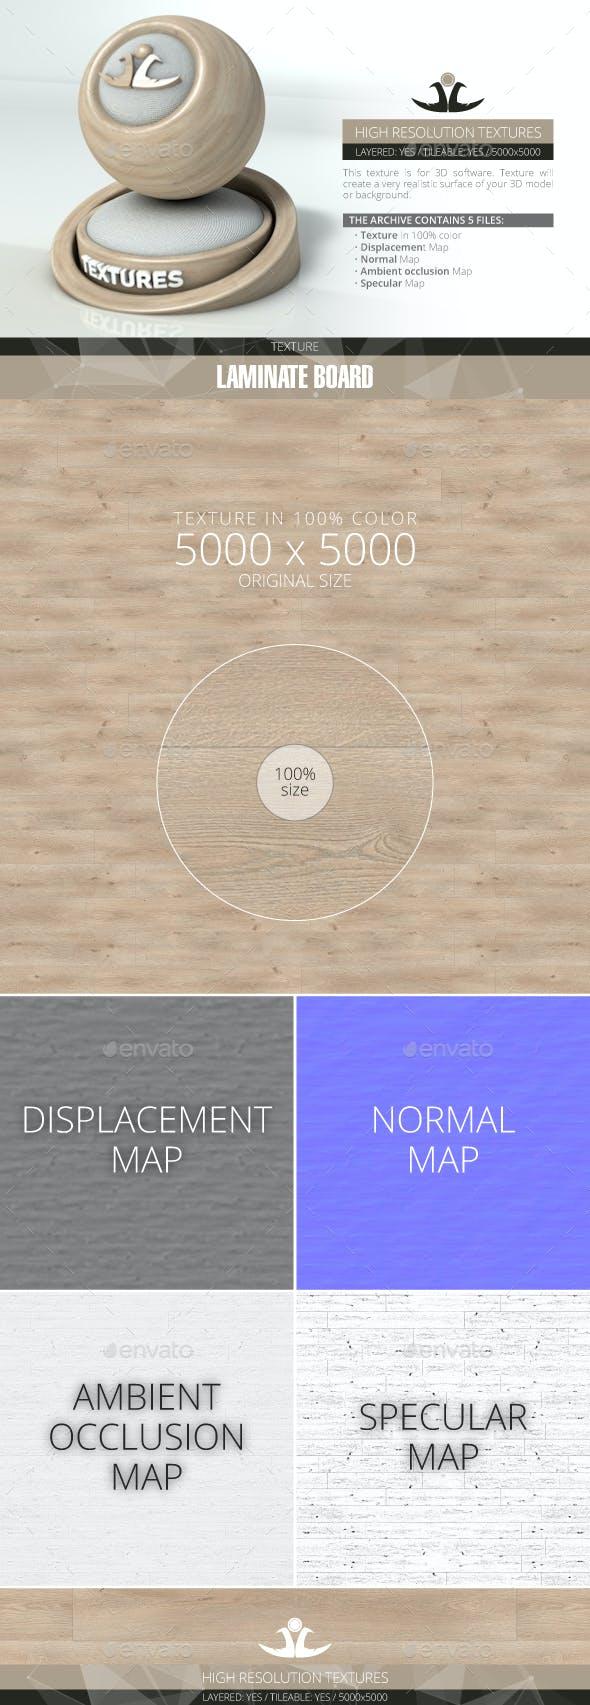 Laminate Board 15 - 3DOcean Item for Sale